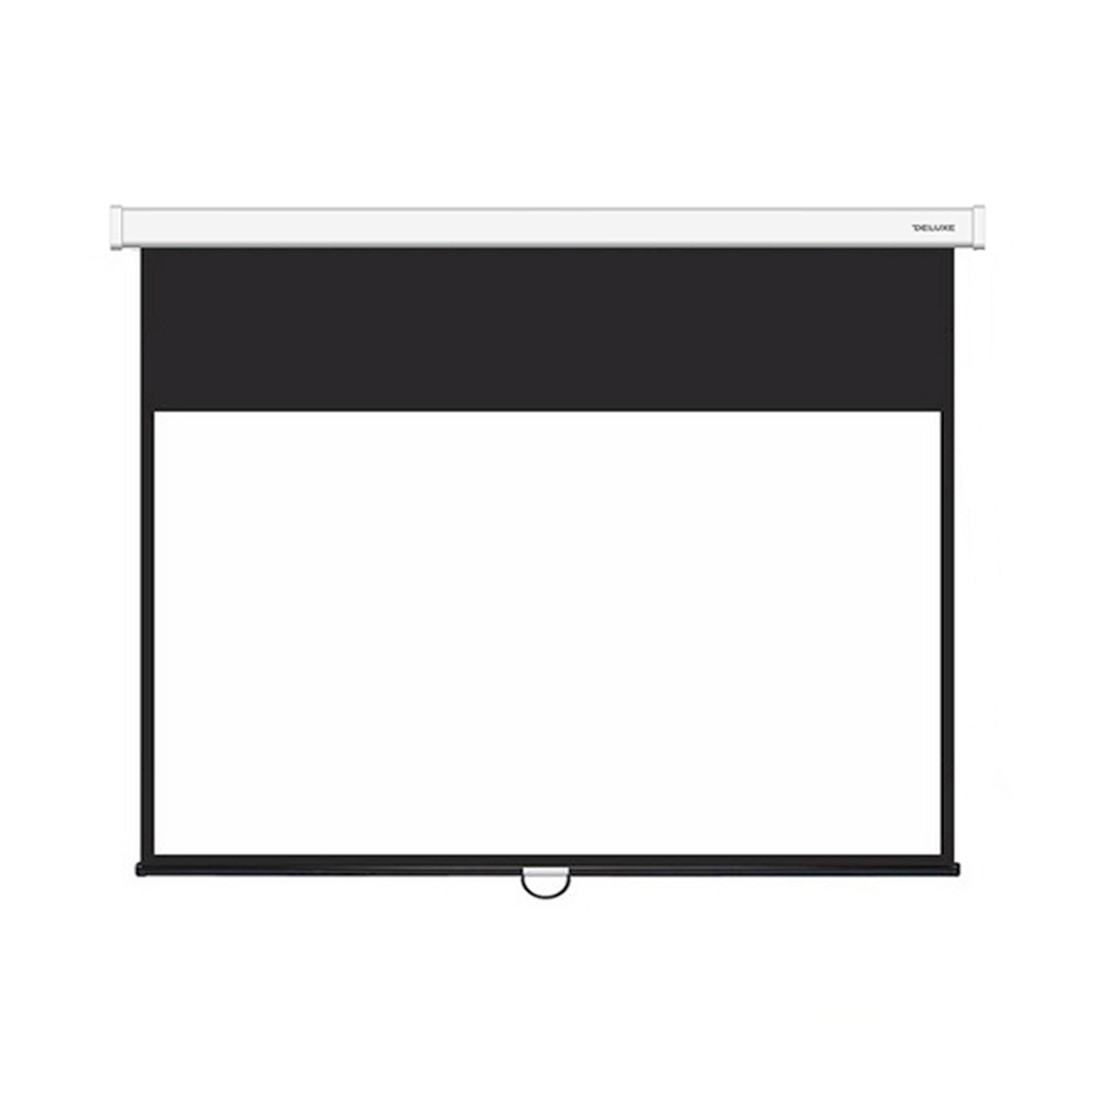 "Экран Deluxe DLS-M300x180W (118""х70""), Ø - 137"", 16:9"